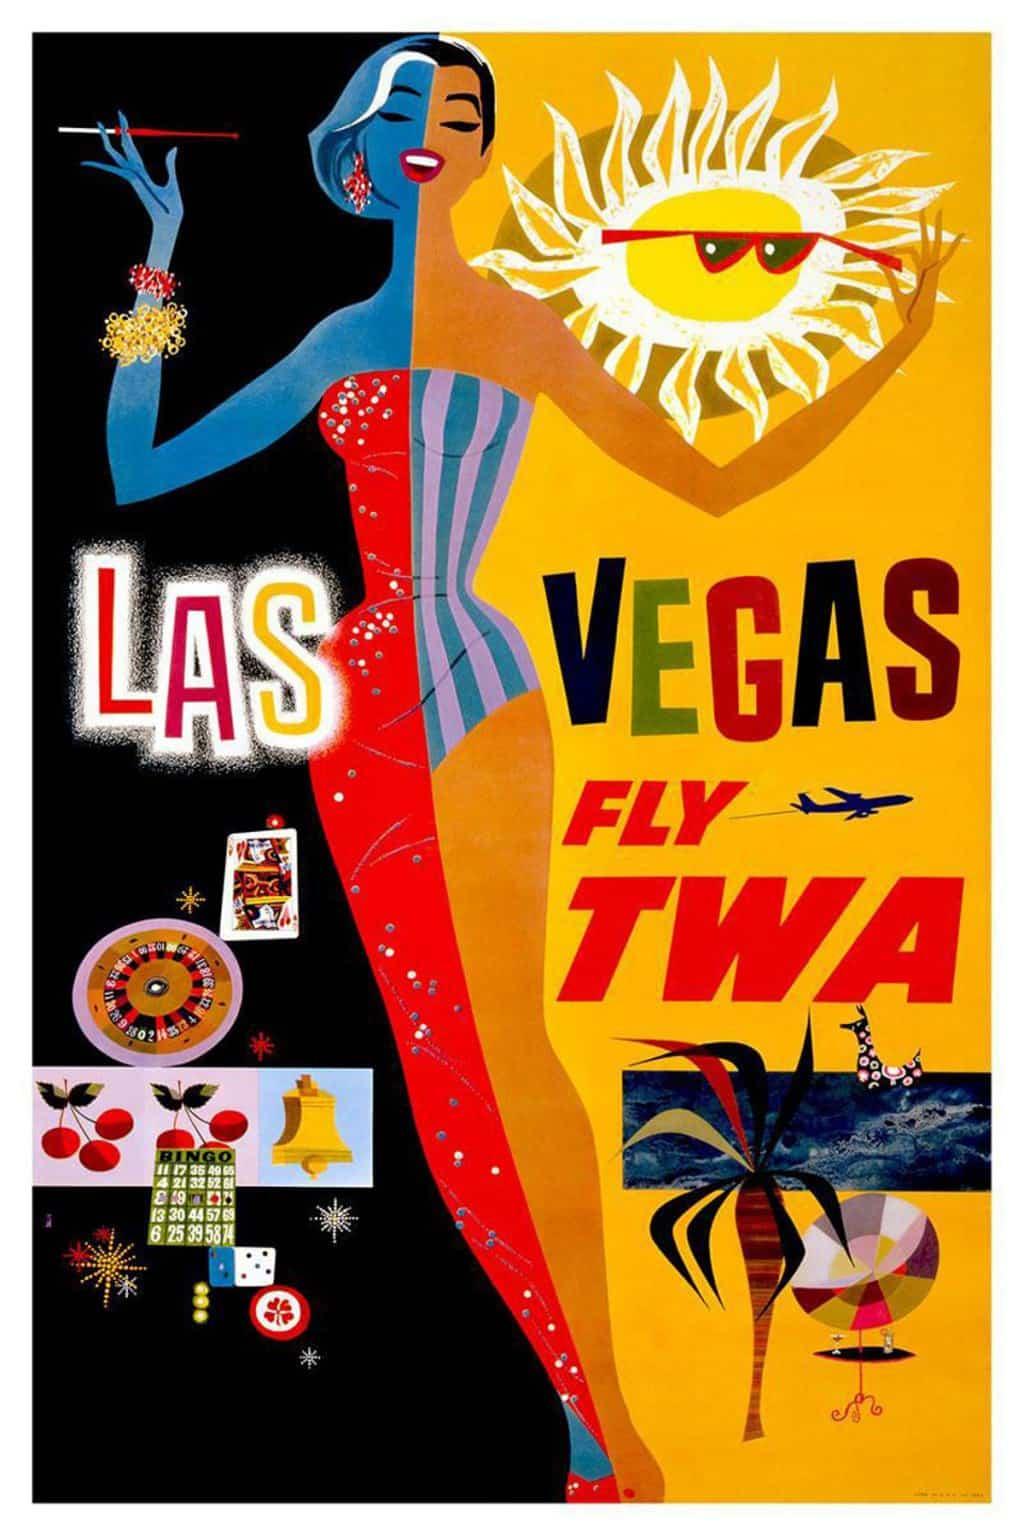 las vegas vintage poster jpg 1500x1000